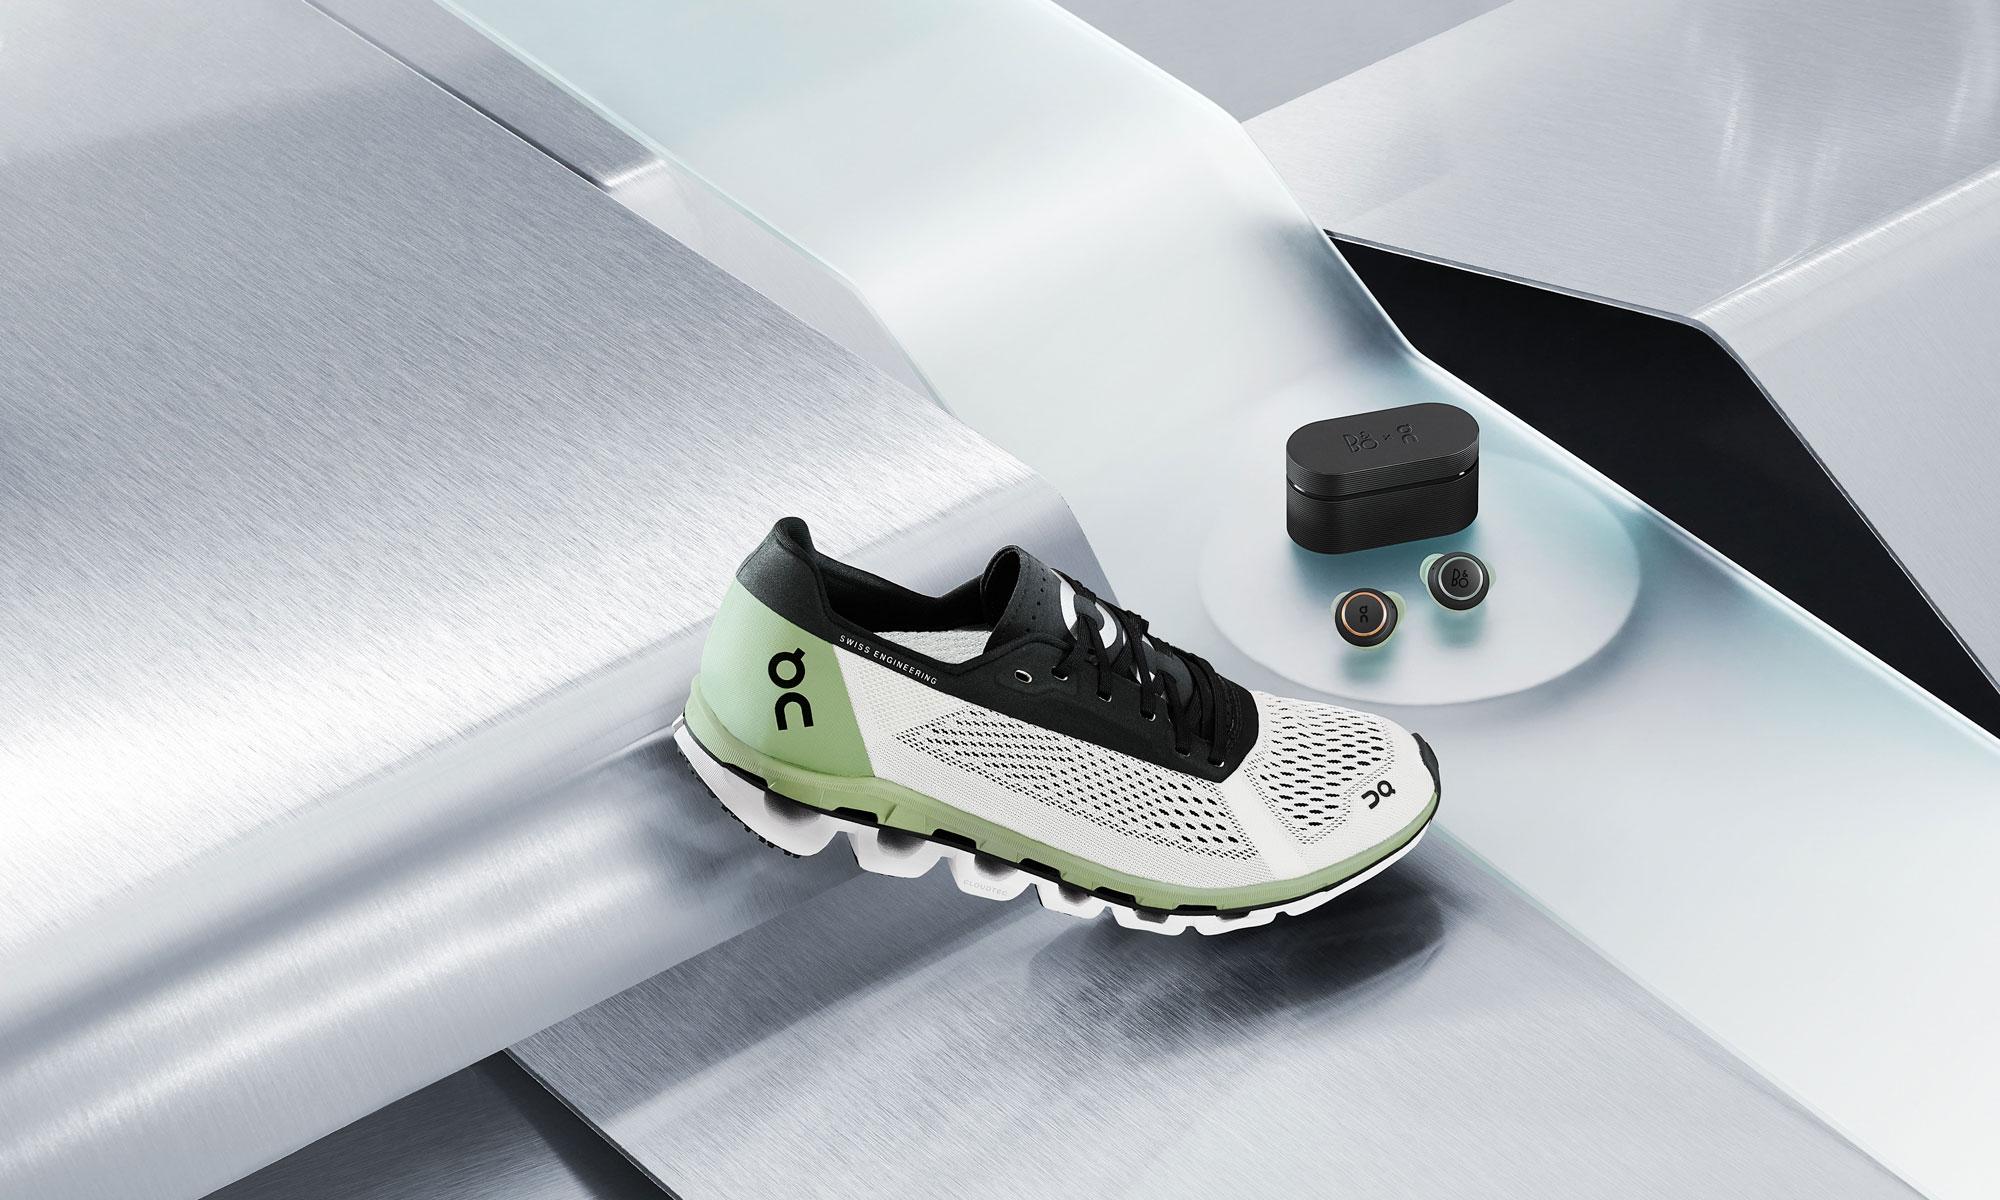 On 昂跑与丹麦视听品牌 Bang & Olufsen 携手推出高品质跑步装备